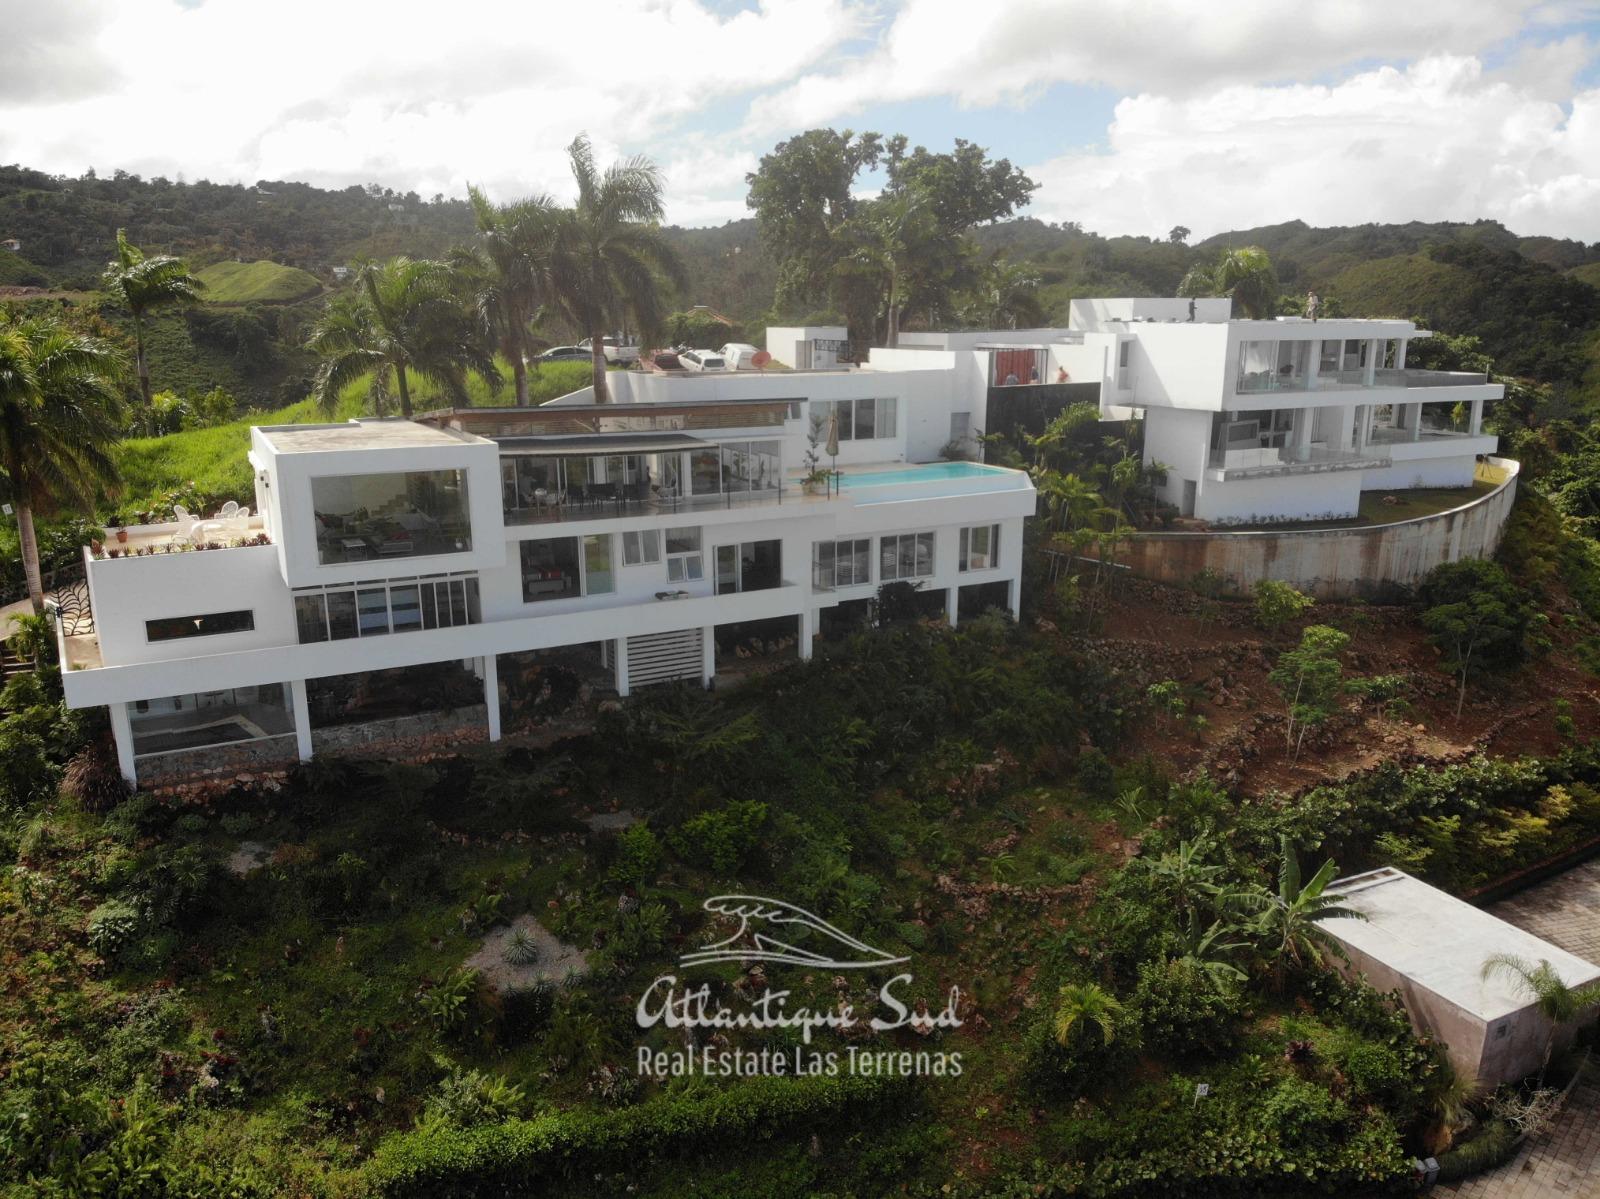 Hillside Lots for sale in Las Terrenas27.jpeg